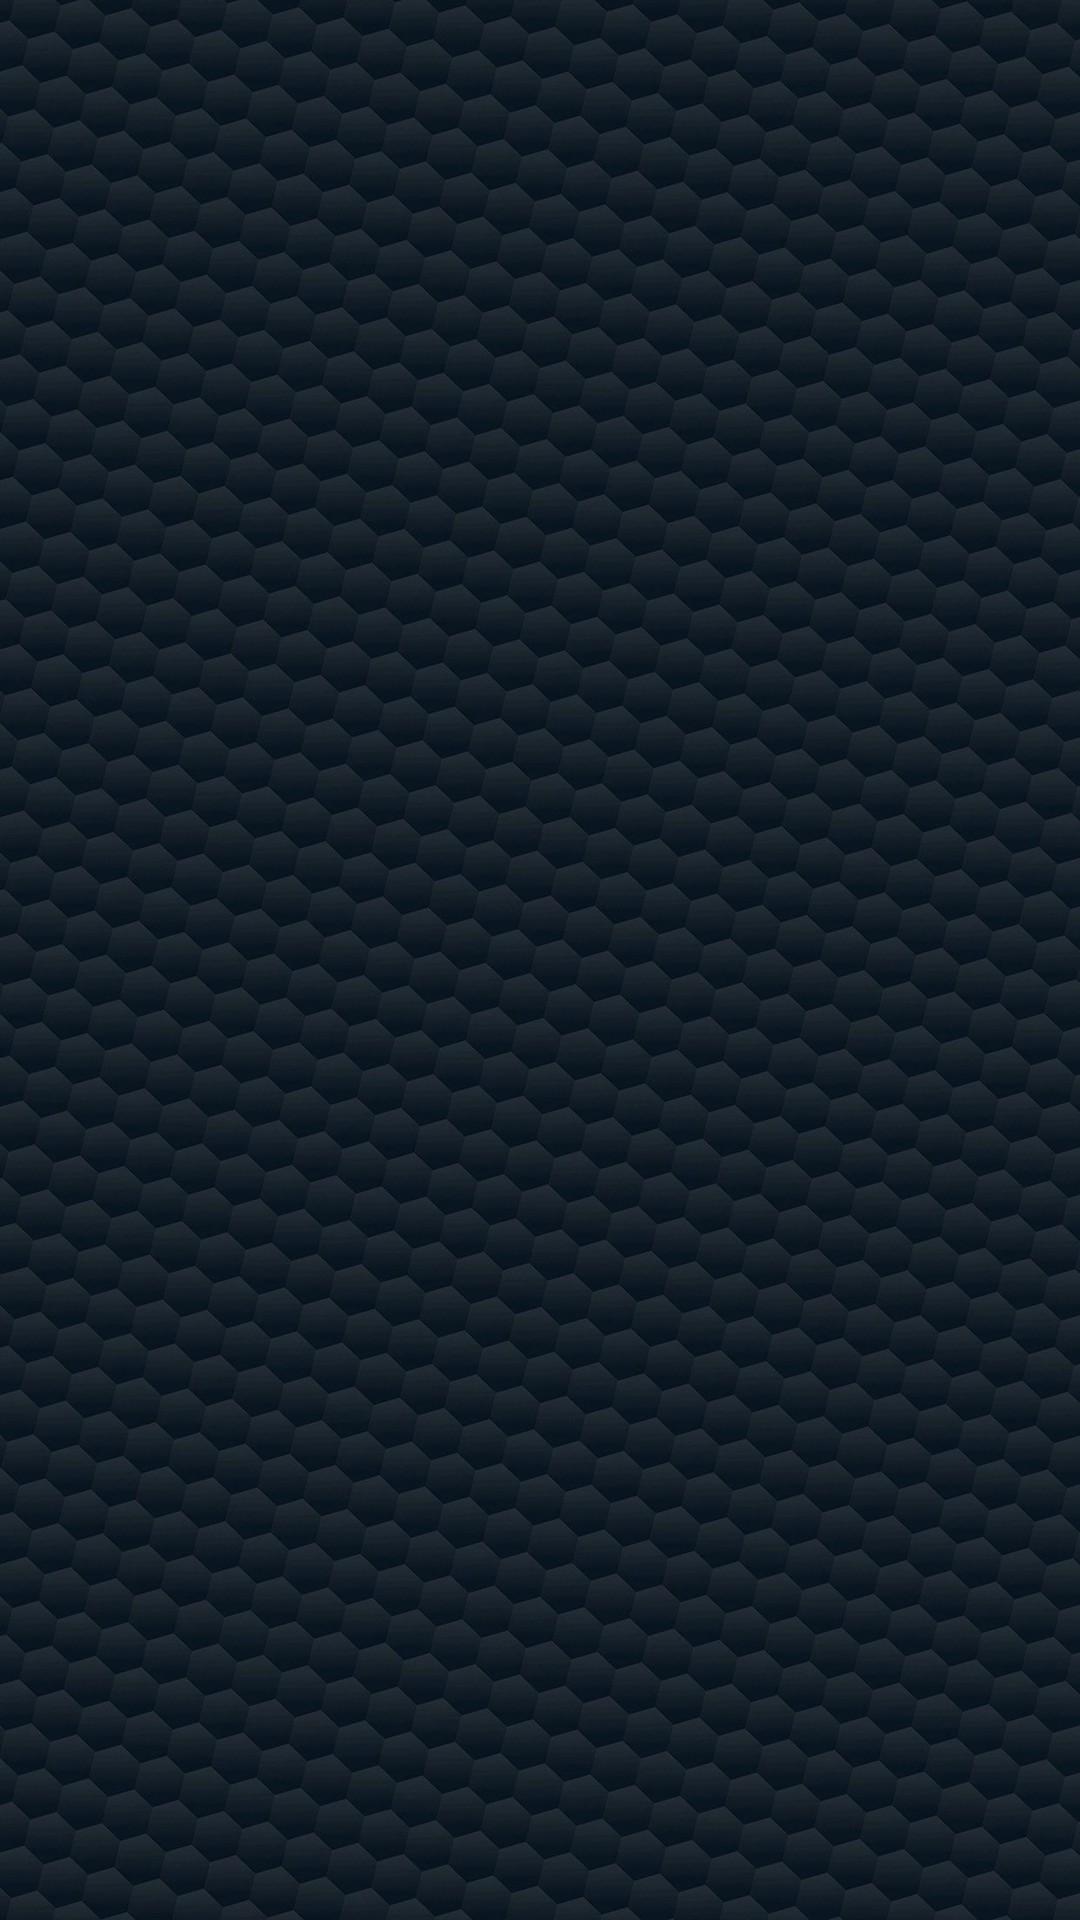 Honeycomb Dark Blue Poly Pattern iPhone 6 wallpaper